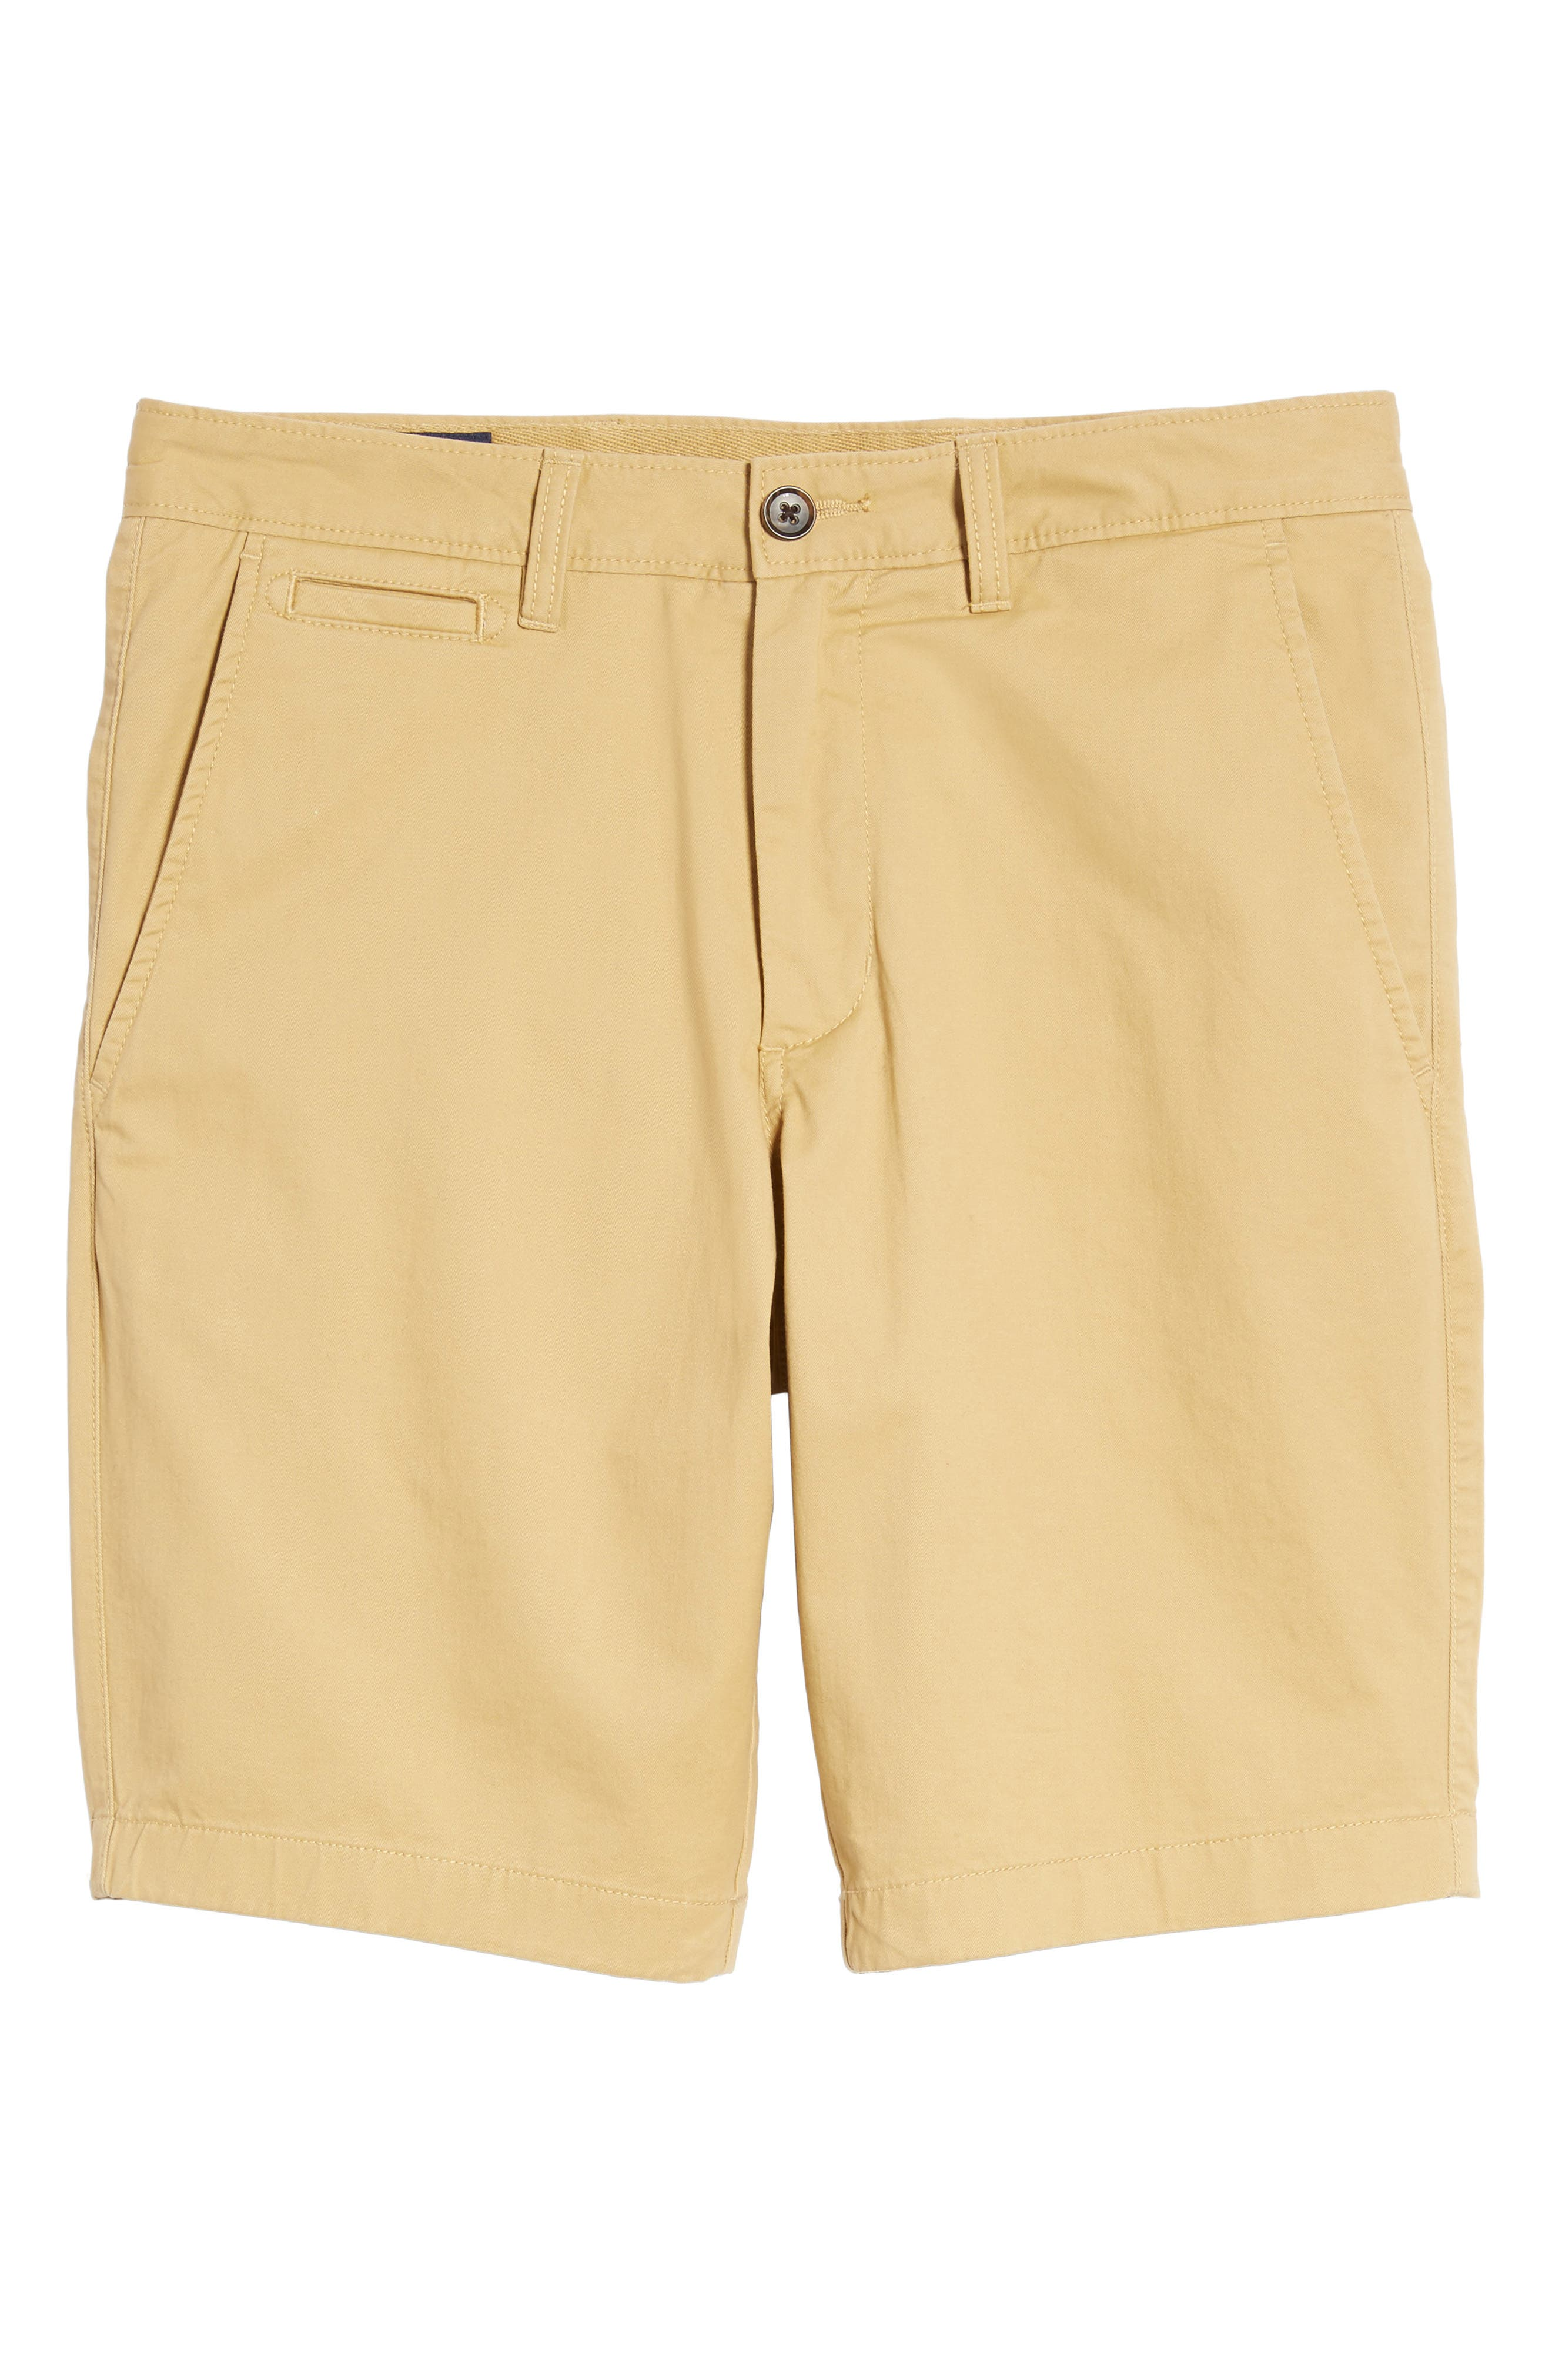 Ballard Slim Fit Stretch Chino 11-Inch Shorts,                             Alternate thumbnail 78, color,